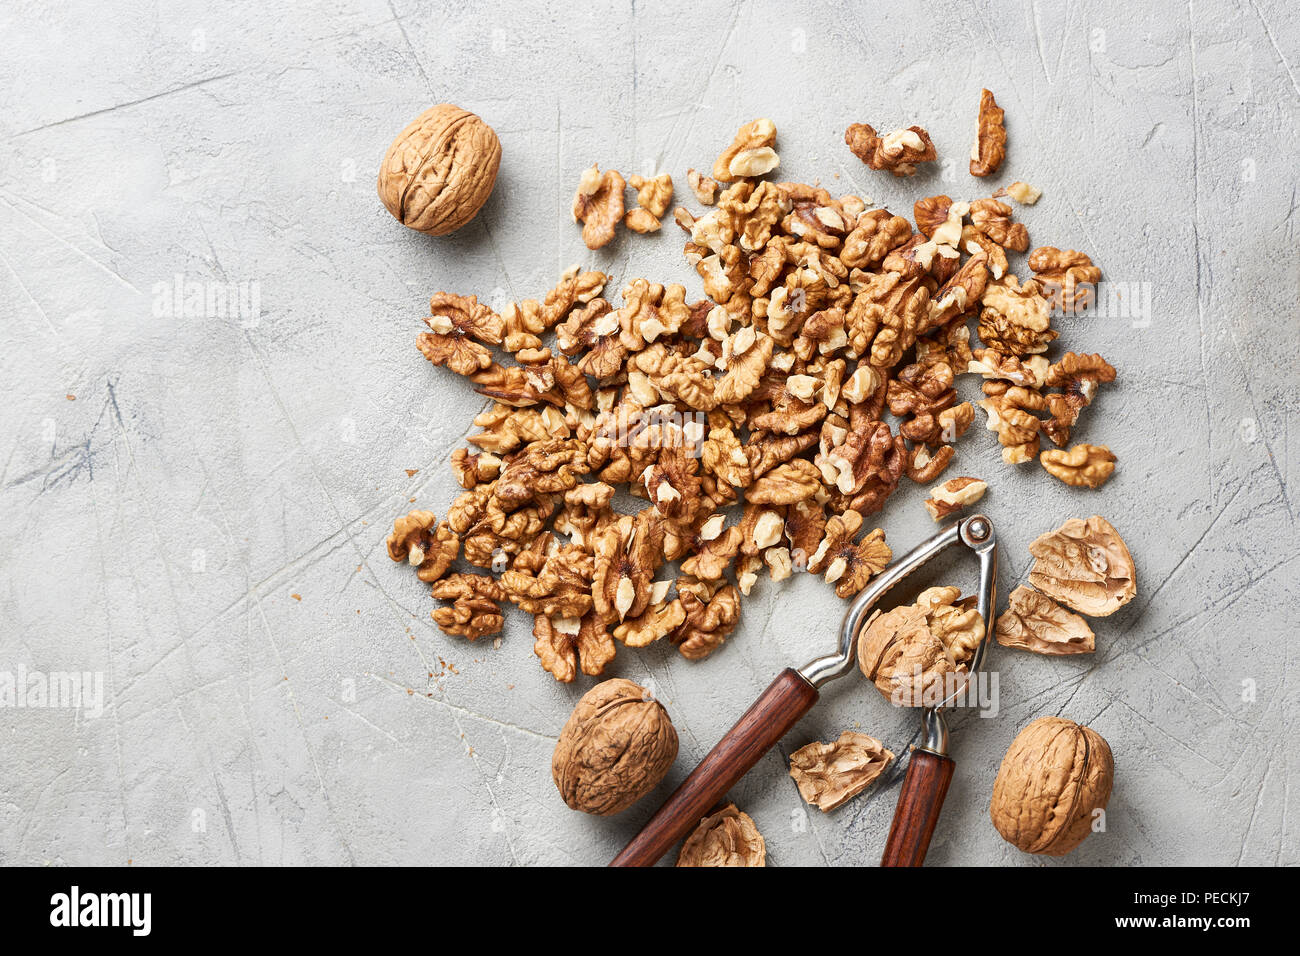 Walnut kernels on gray background with nutcracker. - Stock Image